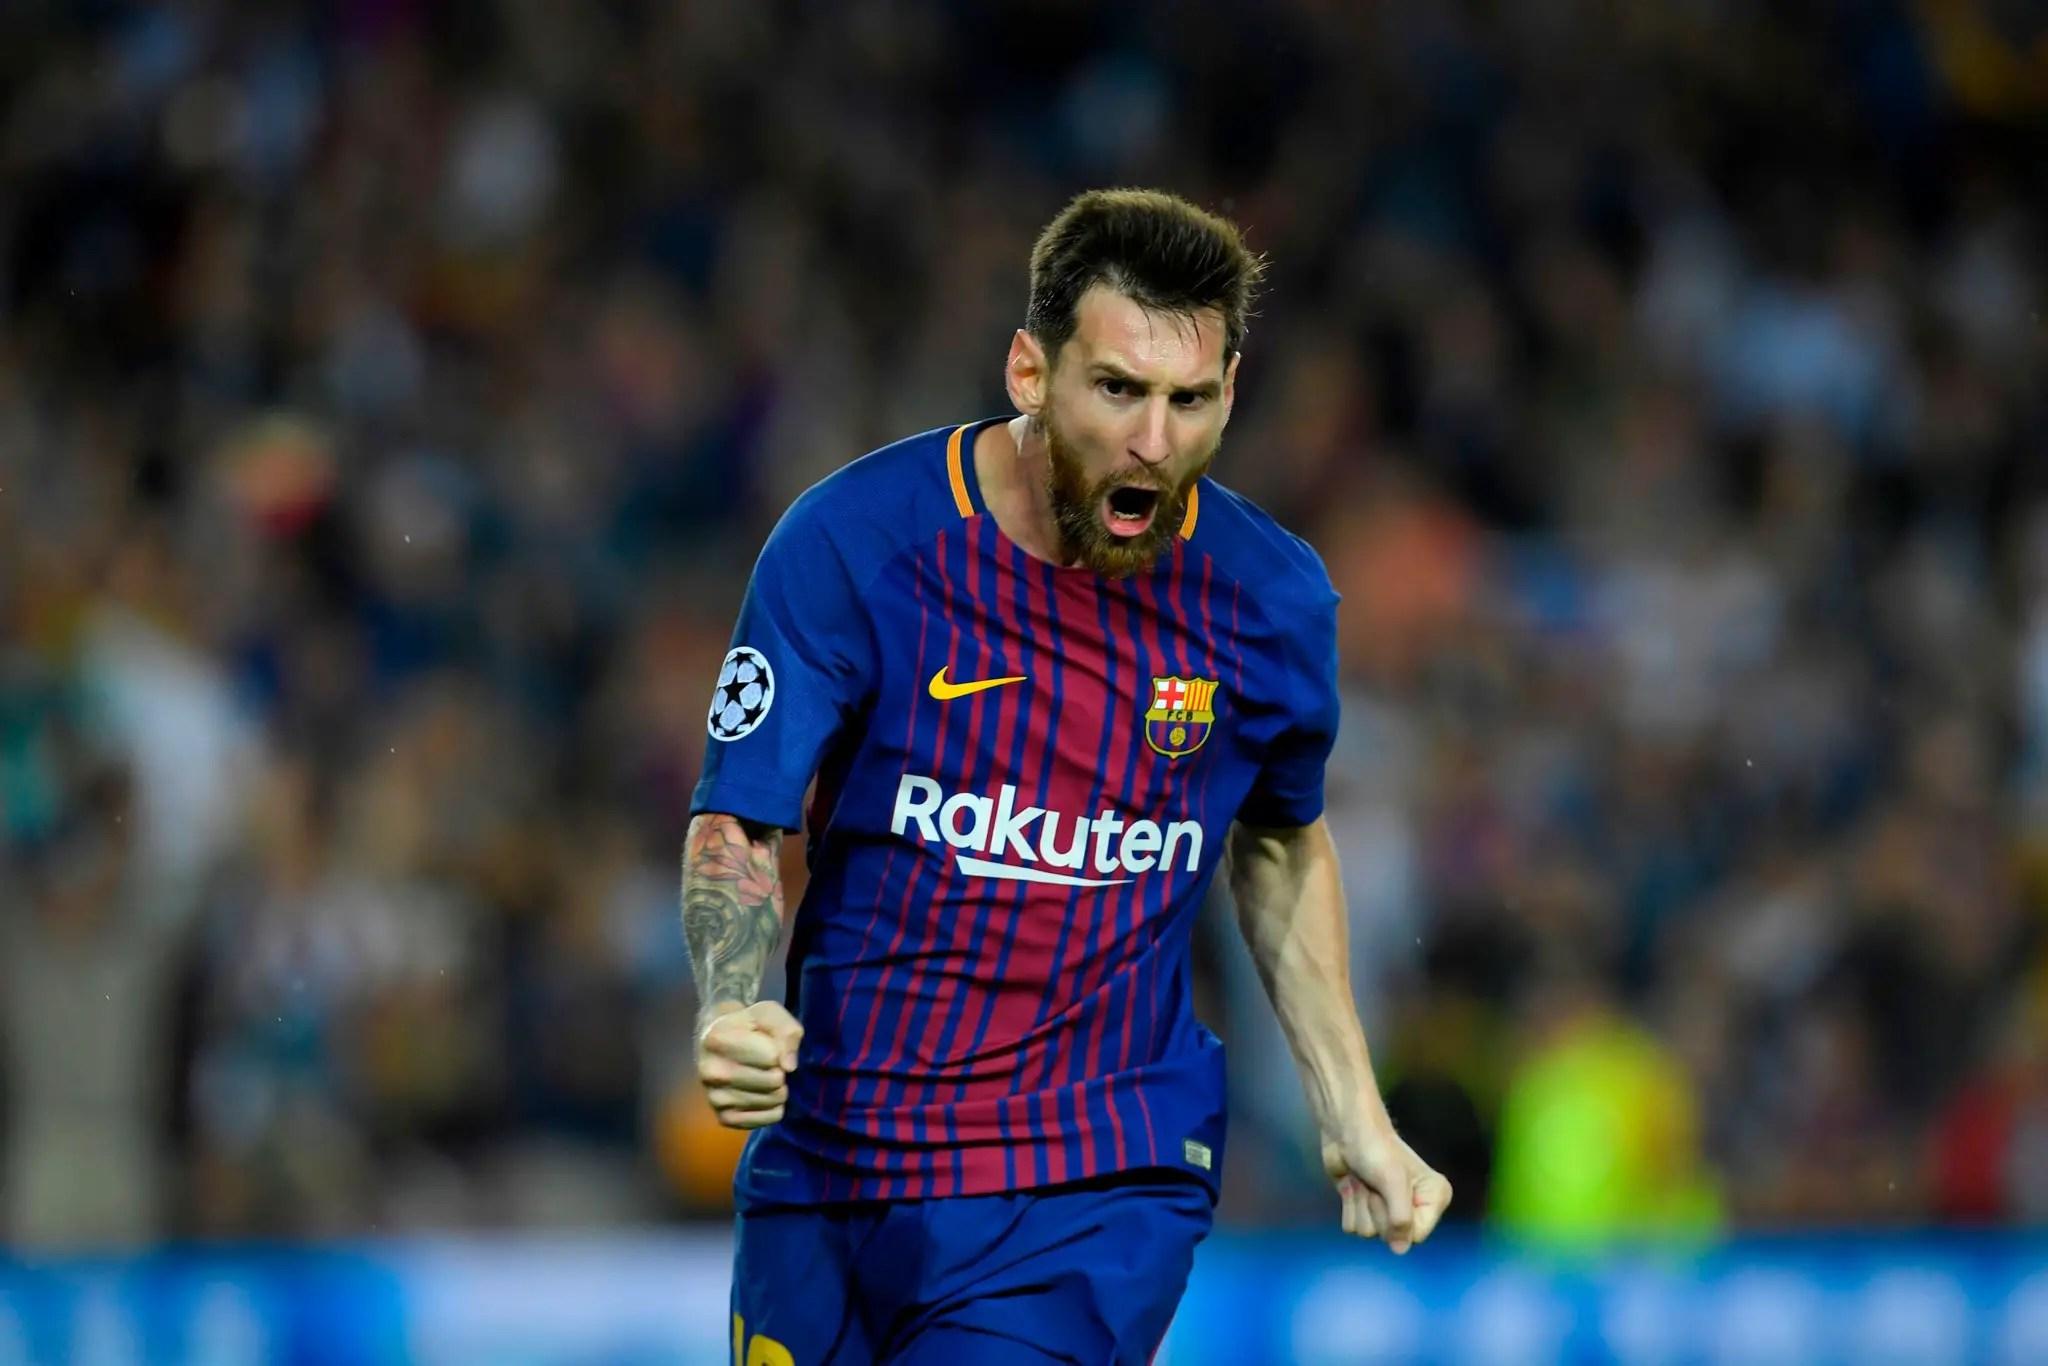 Champions League: Moses Benched In Chelsea Rout; Messi, Lukaku, Neymar Score; Onyekuru Debuts